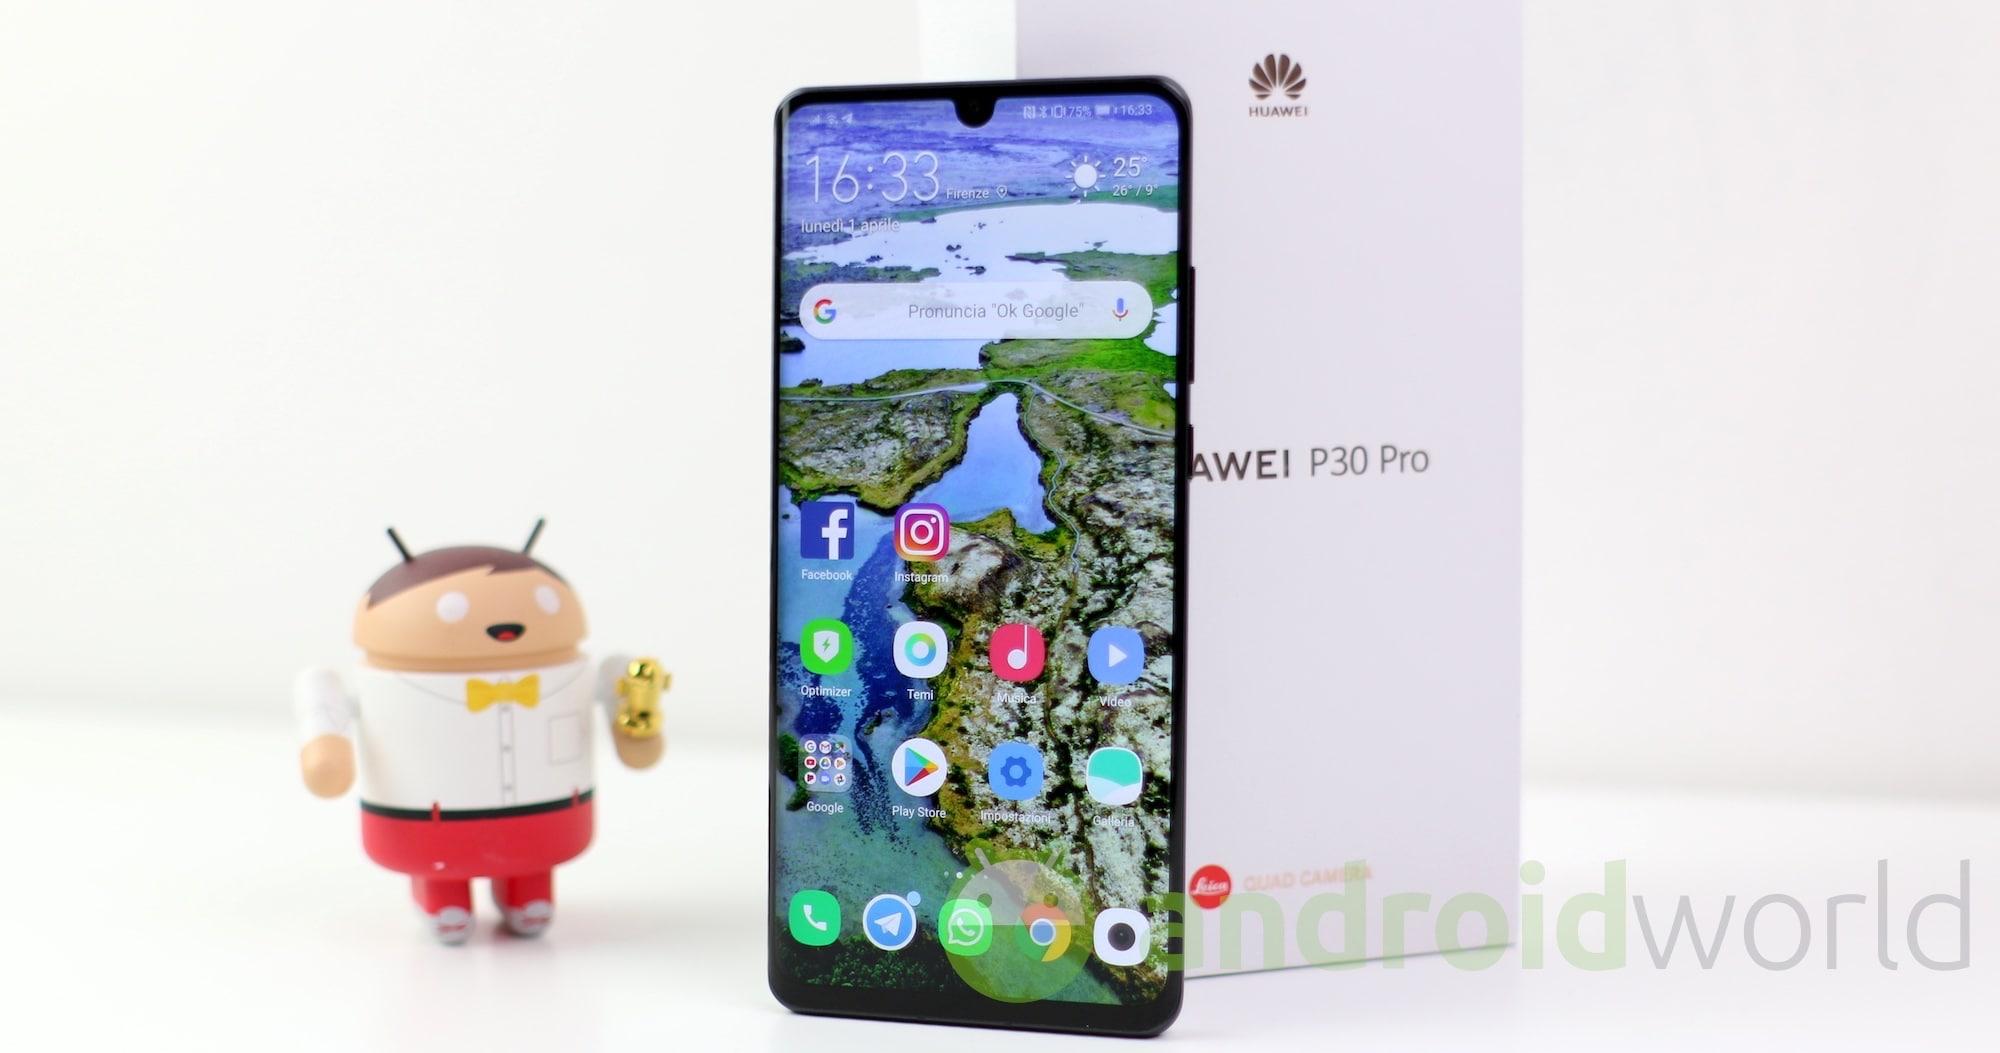 Tris di Huawei in super sconto su eBay: P30 Pro, Mate 20 Lite e P Smart 2019